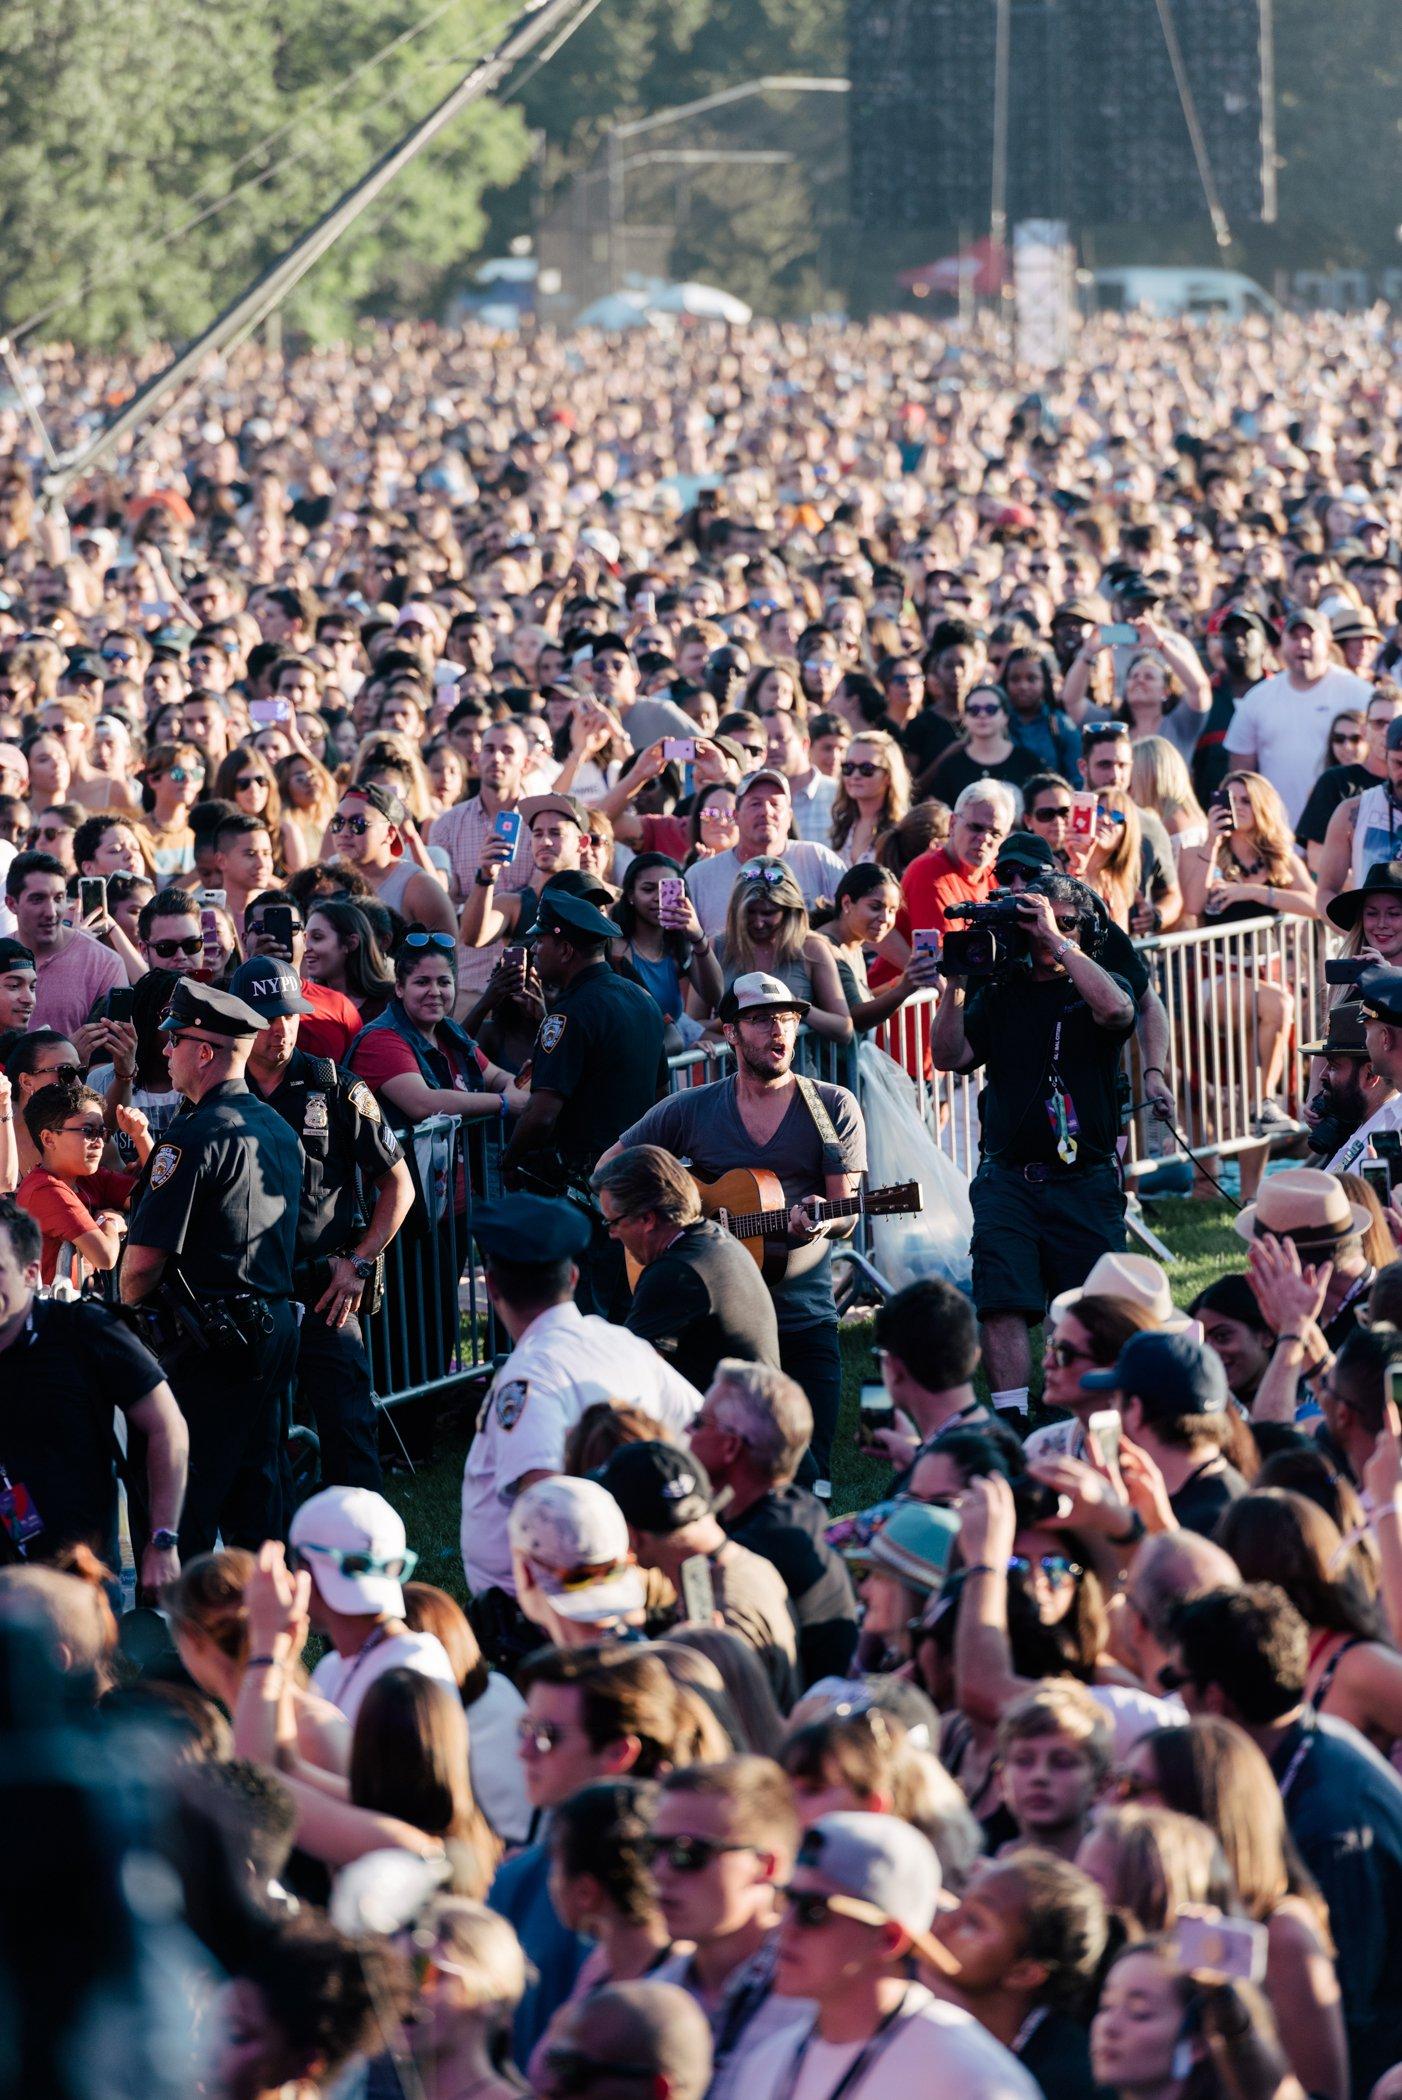 GCF17_Crowd_DanielDorsaForGlobalCitizen221.jpg